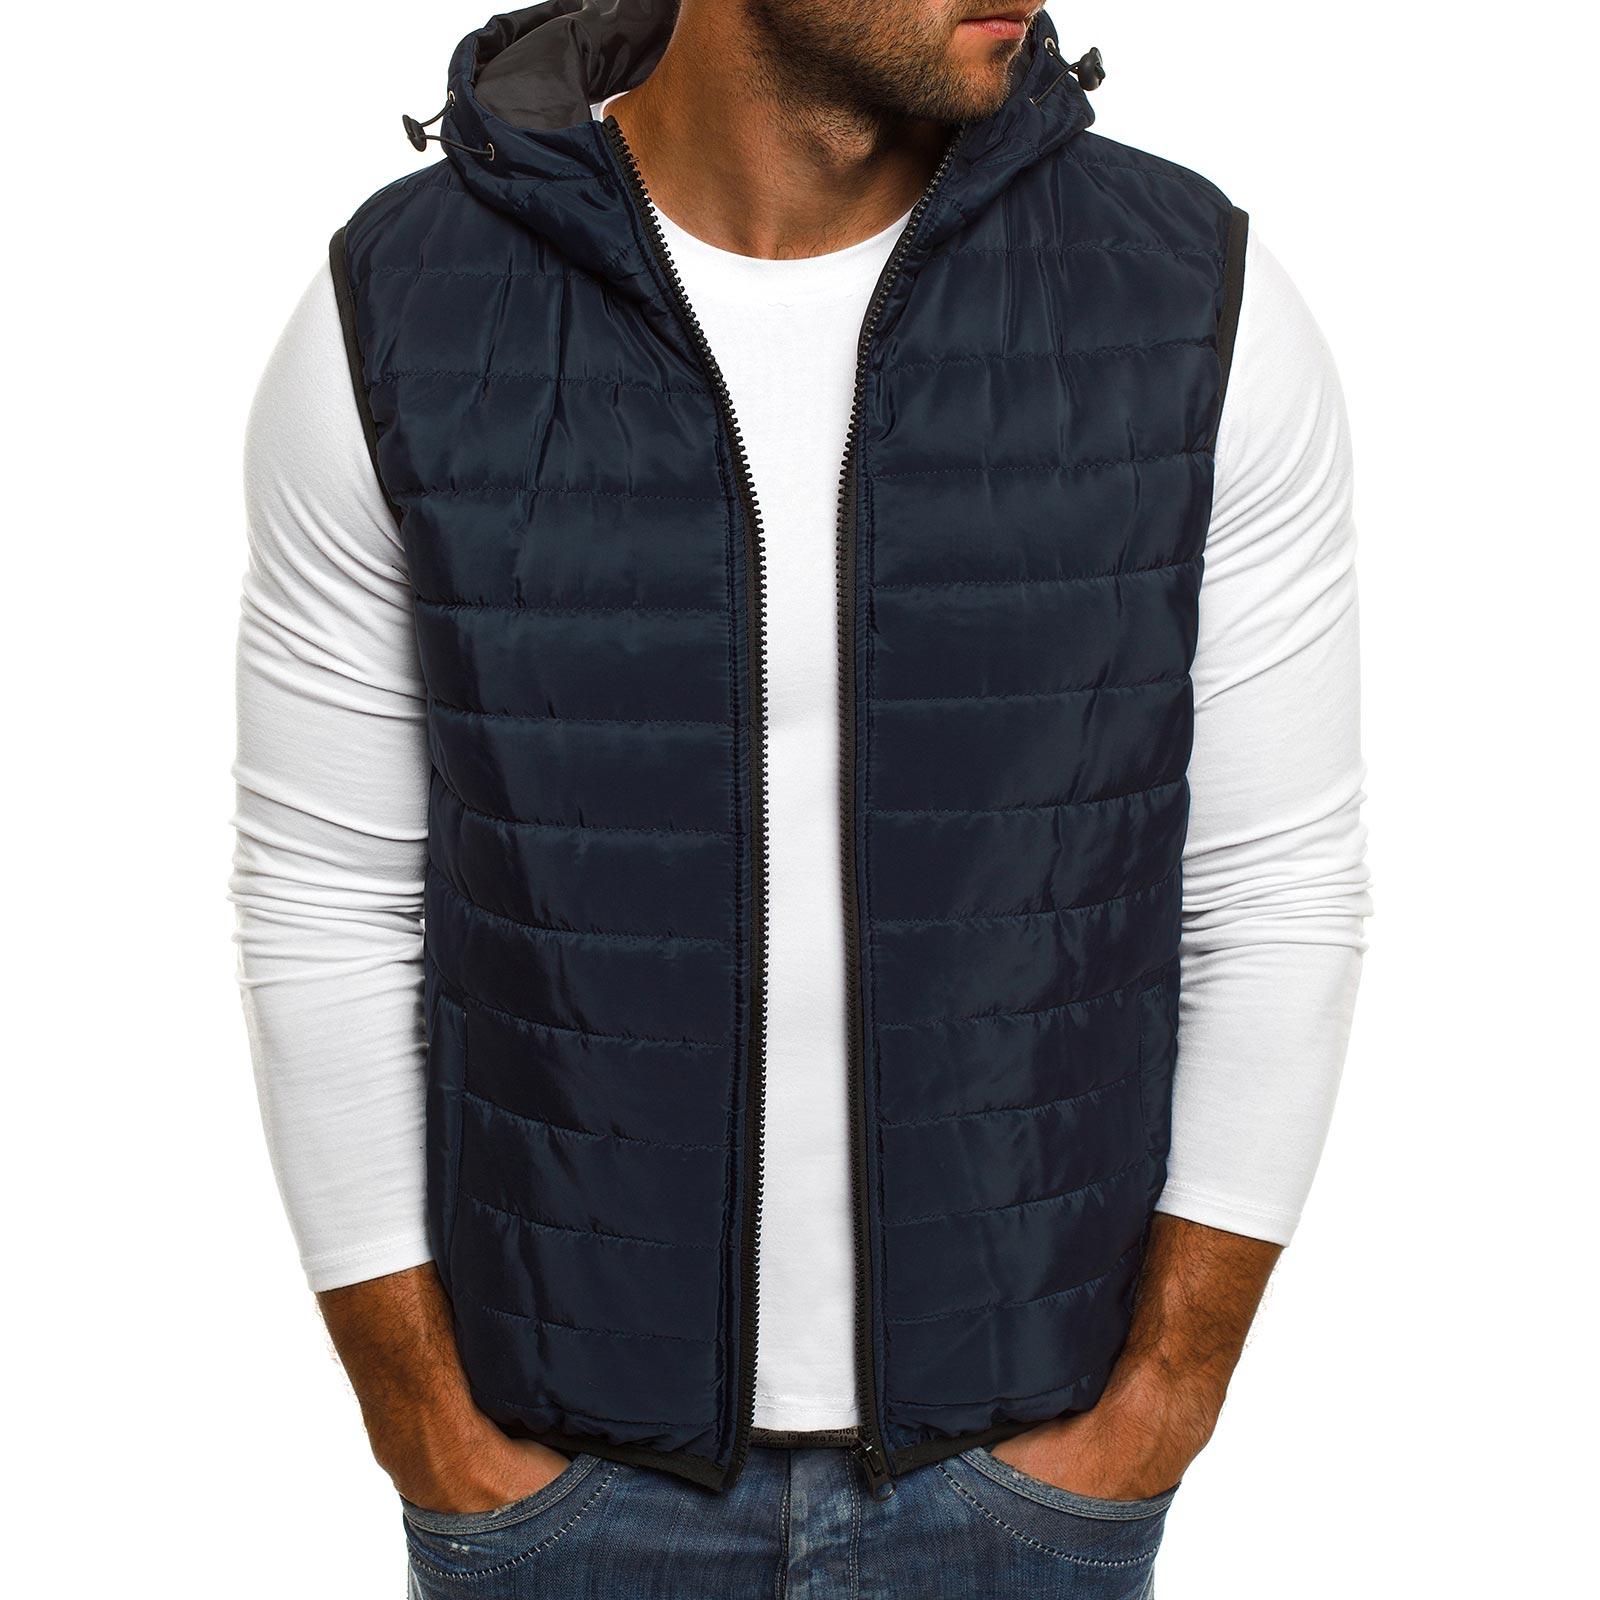 ZOGAA Vest Men New Stylish 2019 Spring Autumn Warm Sleeveless Jacket Winter Waistcoat Mens Casual Coats mens vest